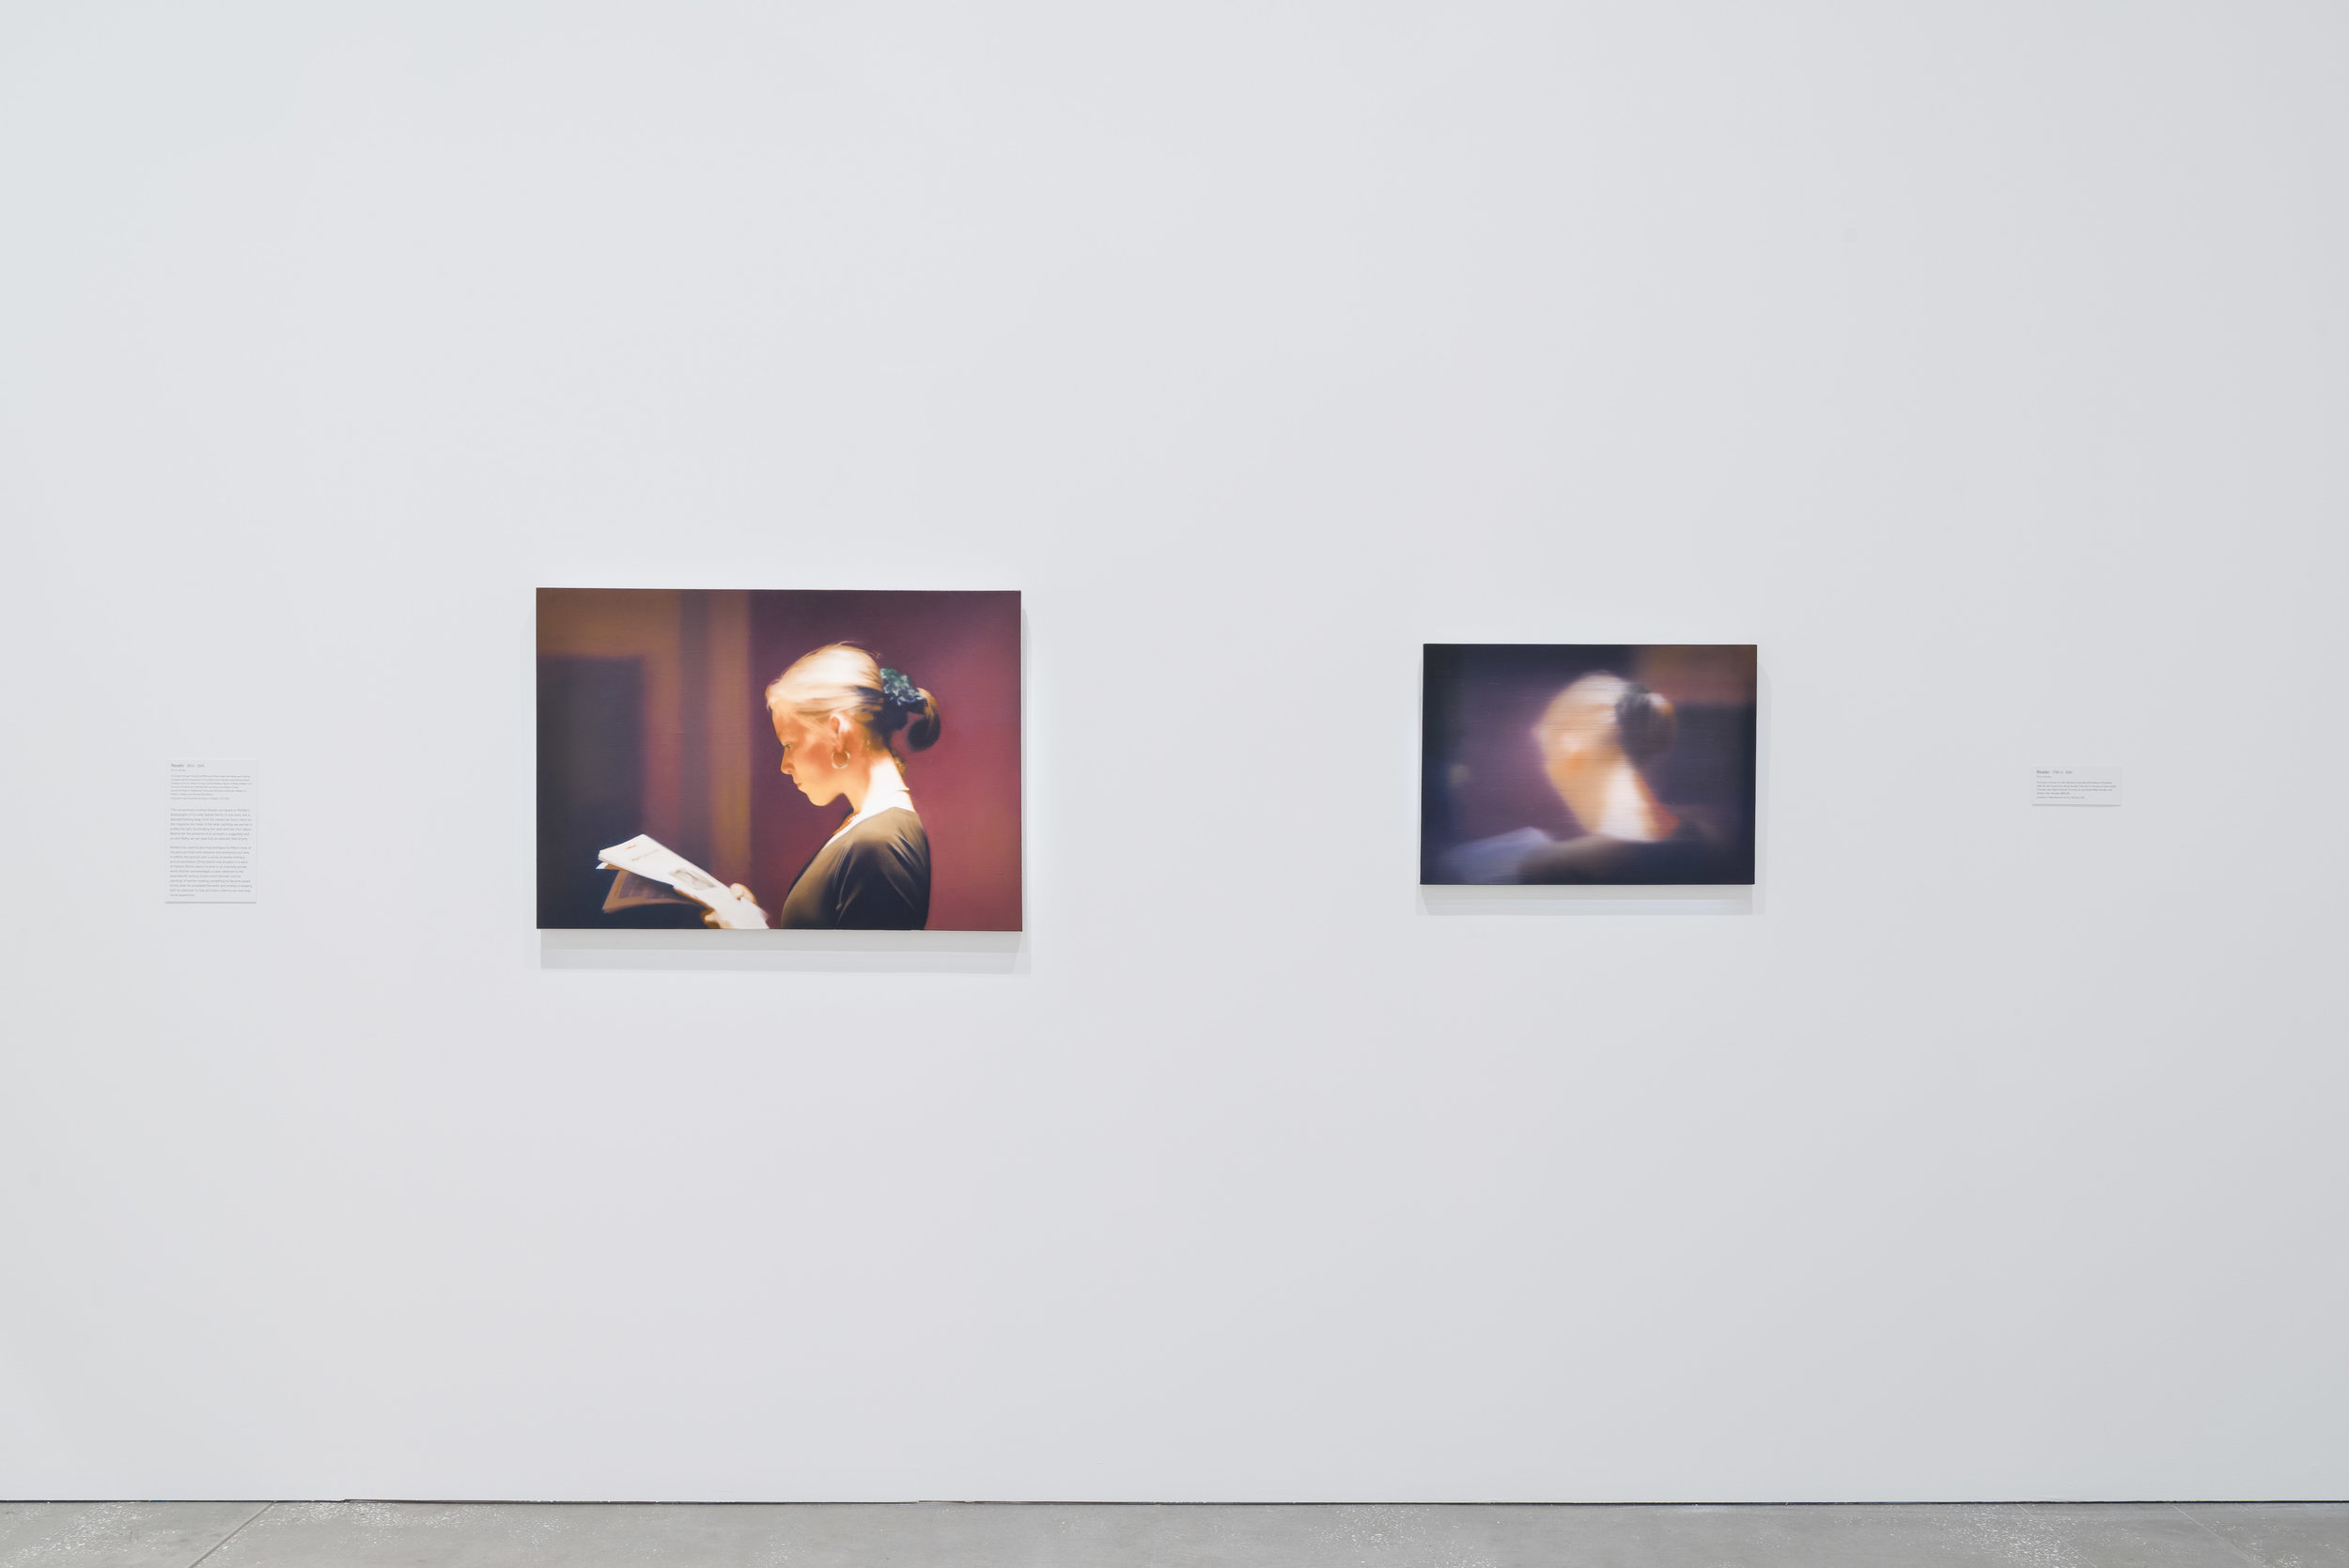 Gerhard Richter: The Life of Images , exhibition installation view, Queensland Art Gallery / Gallery of Modern Art (QAGOMA), Brisbane, 2017, with  Reader (804)  and  Reader (799-1) , both 1994; photo: Natasha Harth, QAGOMA